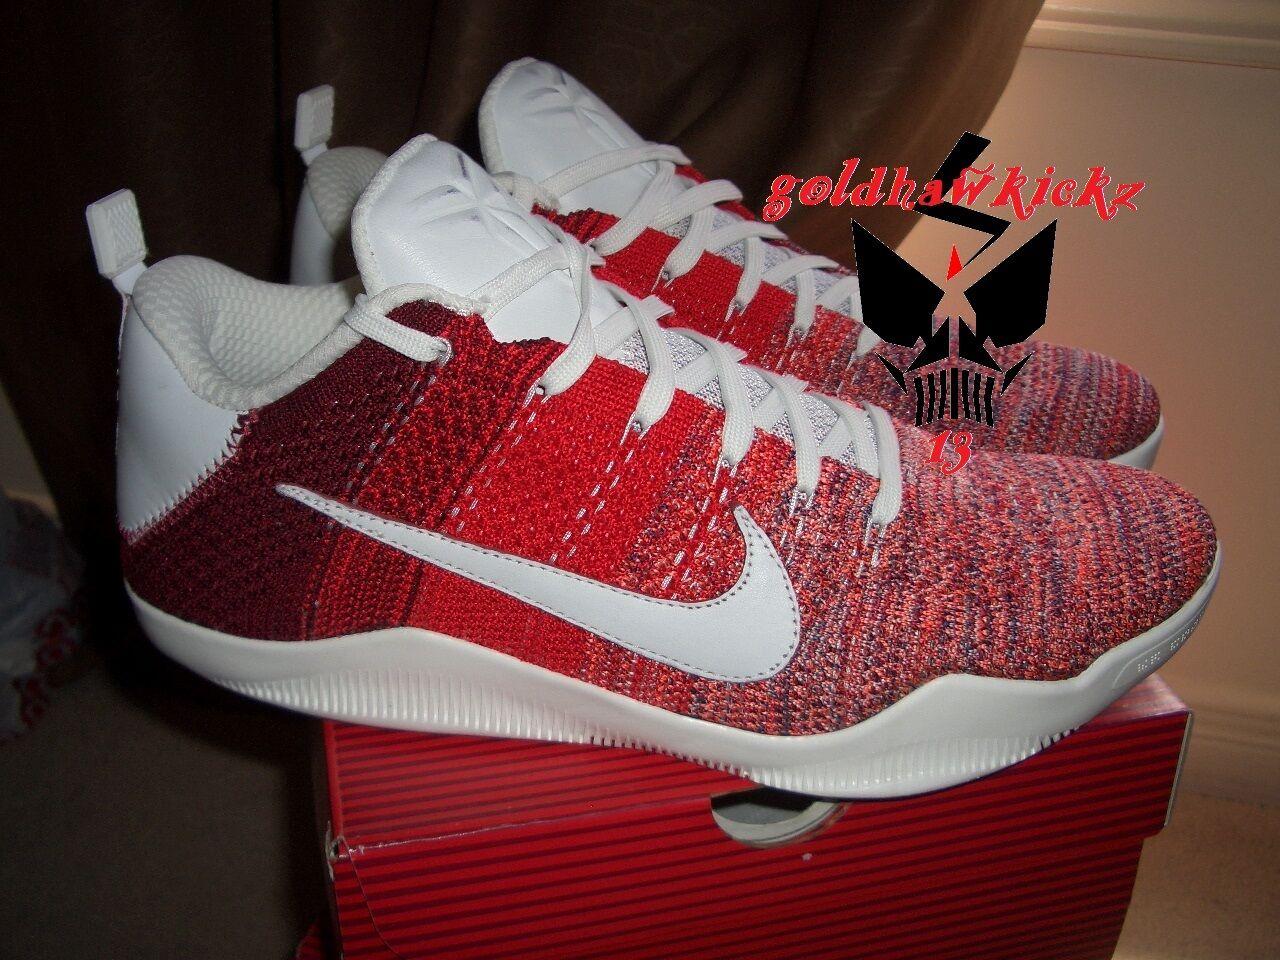 Nike Kobe XI Elite Low 4KB RED HORSE University Red 824463-606 mamba day flyknit